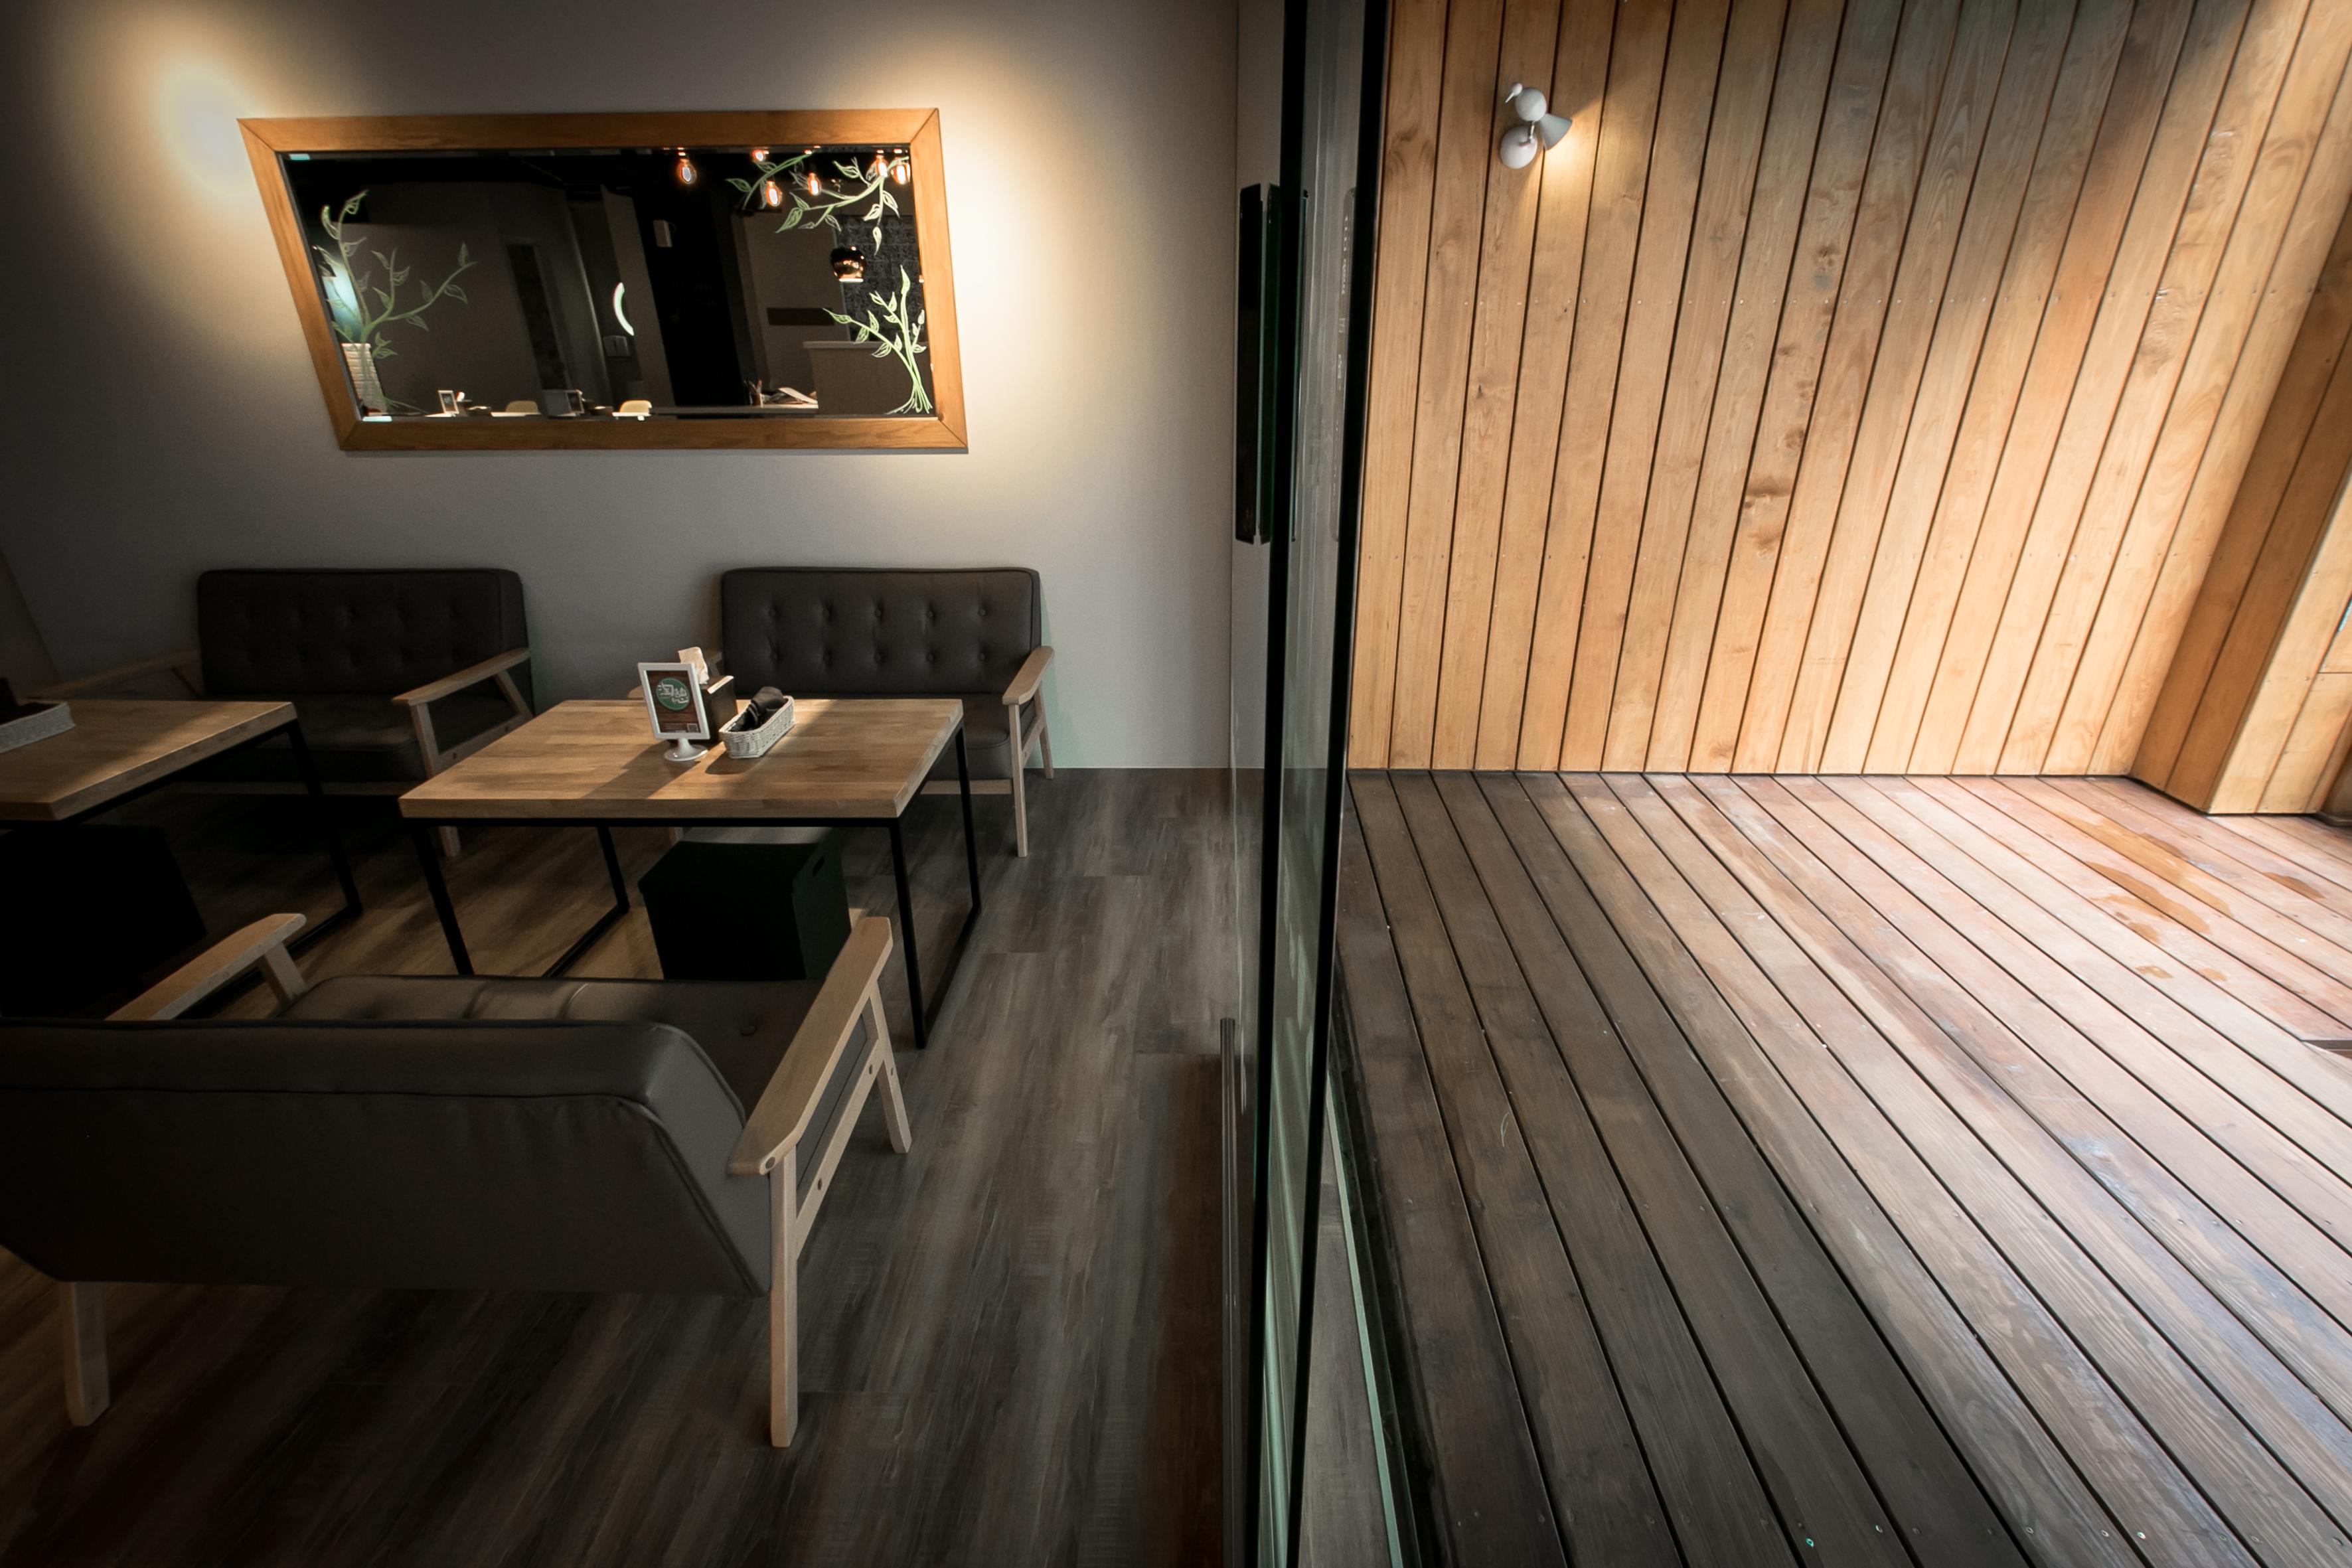 cozy-style 親子餐廳設計 (8)